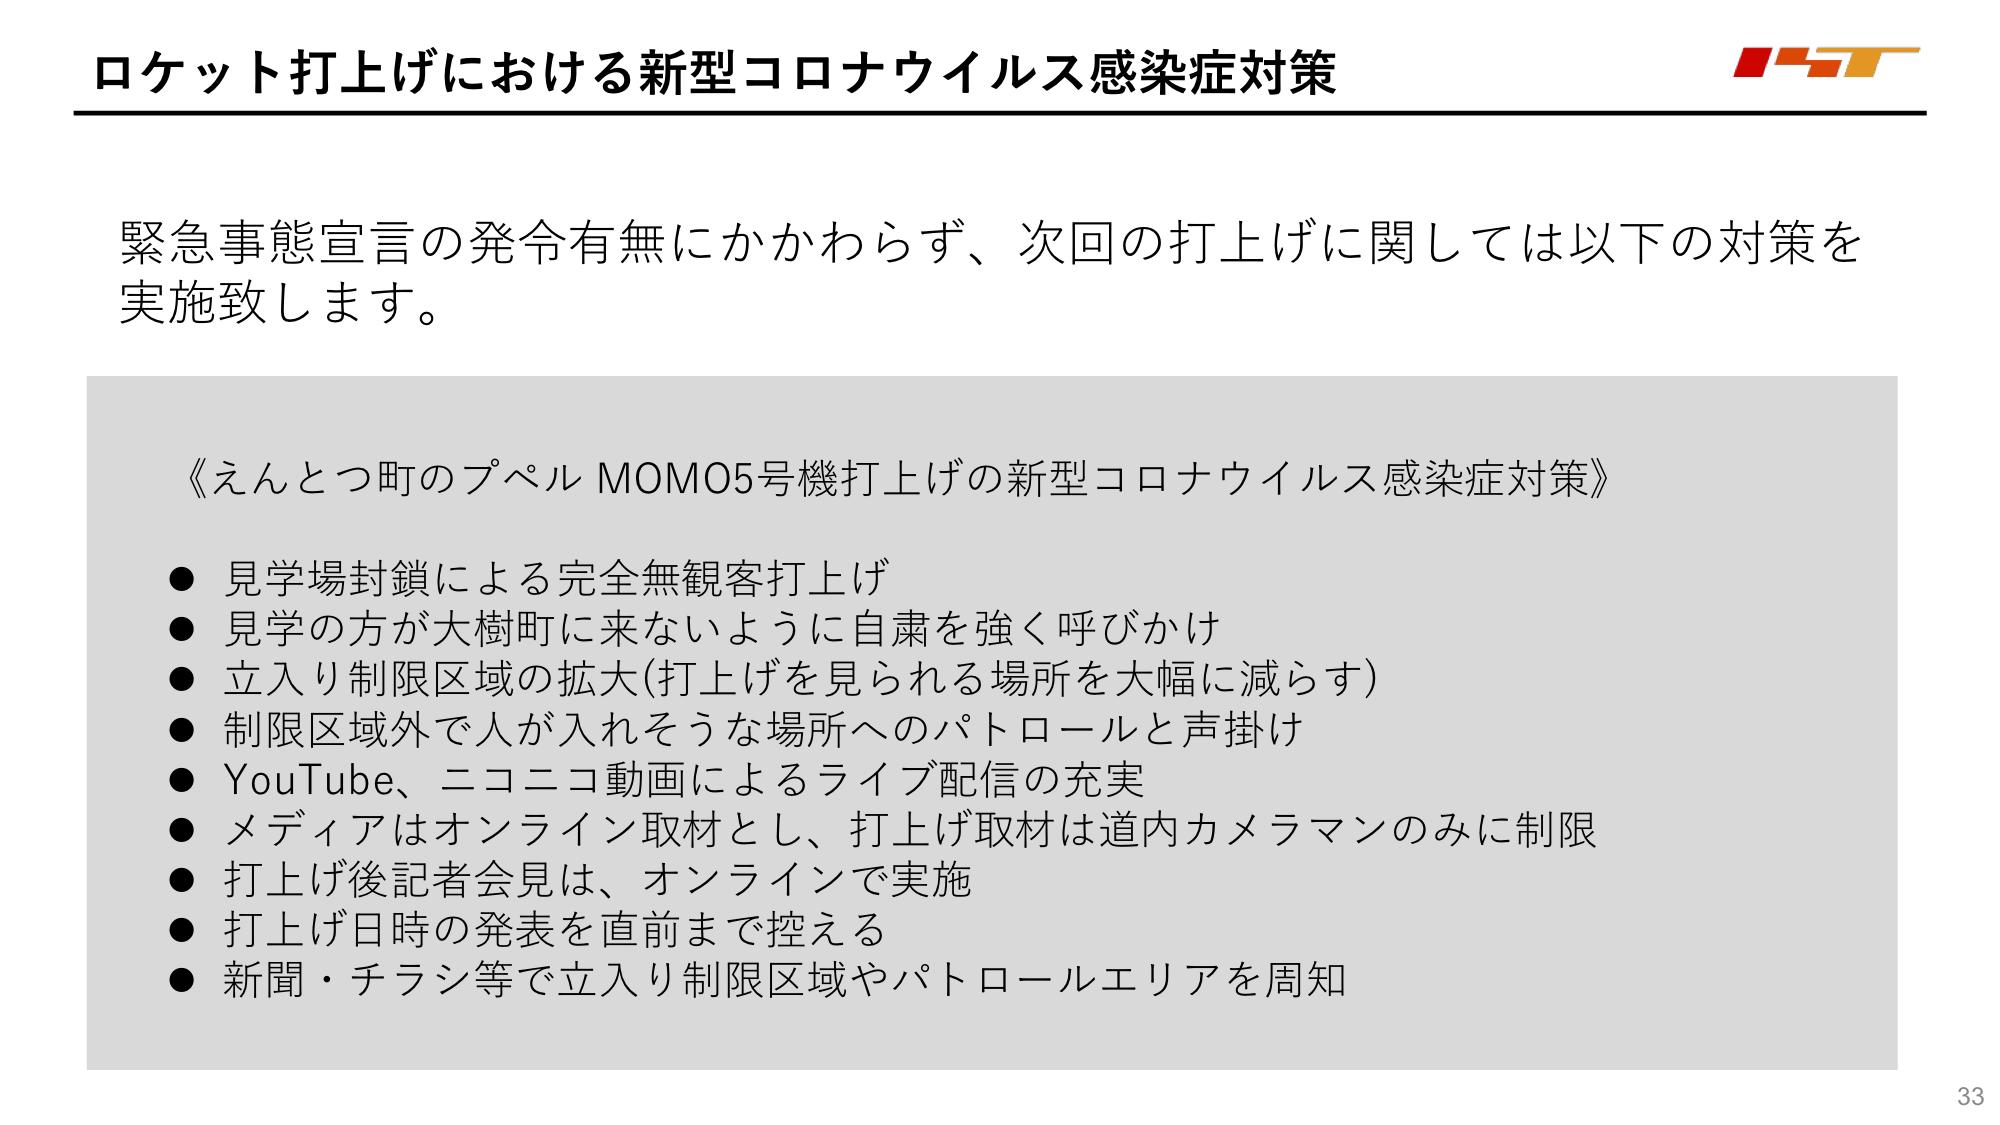 f:id:Imamura:20200603232951p:plain